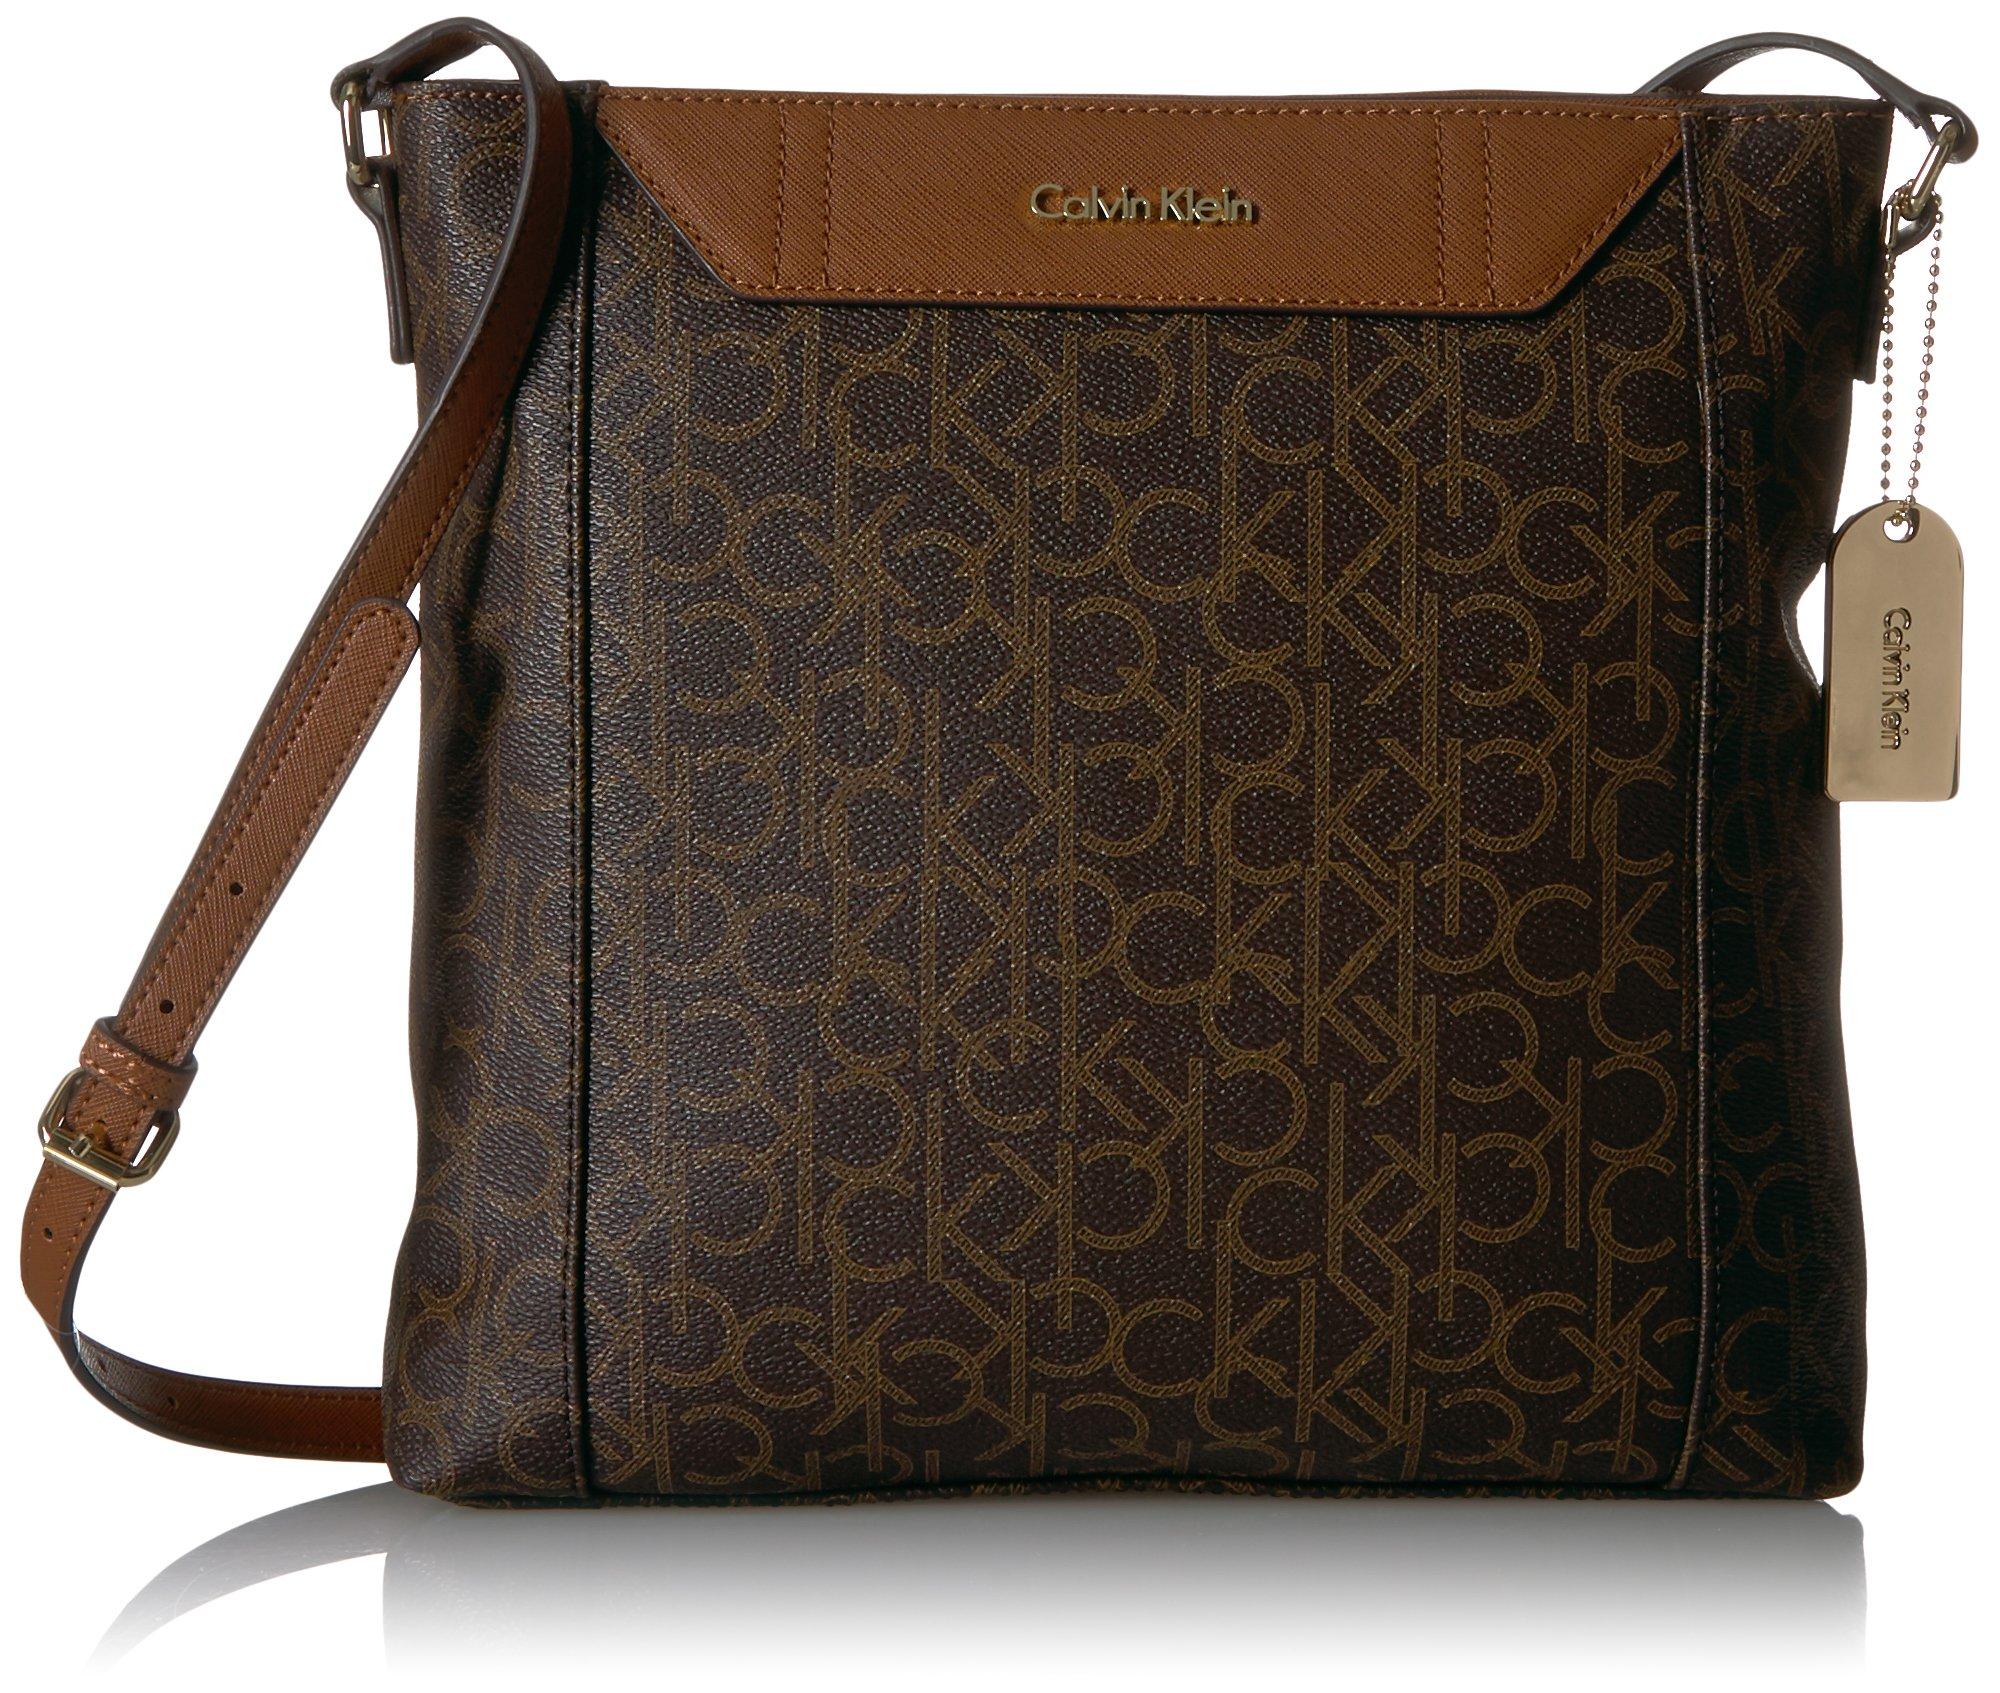 Calvin Klein Dorus Monogram Top Zip Crossbody, Rown/Khk/Luggage Saffiano